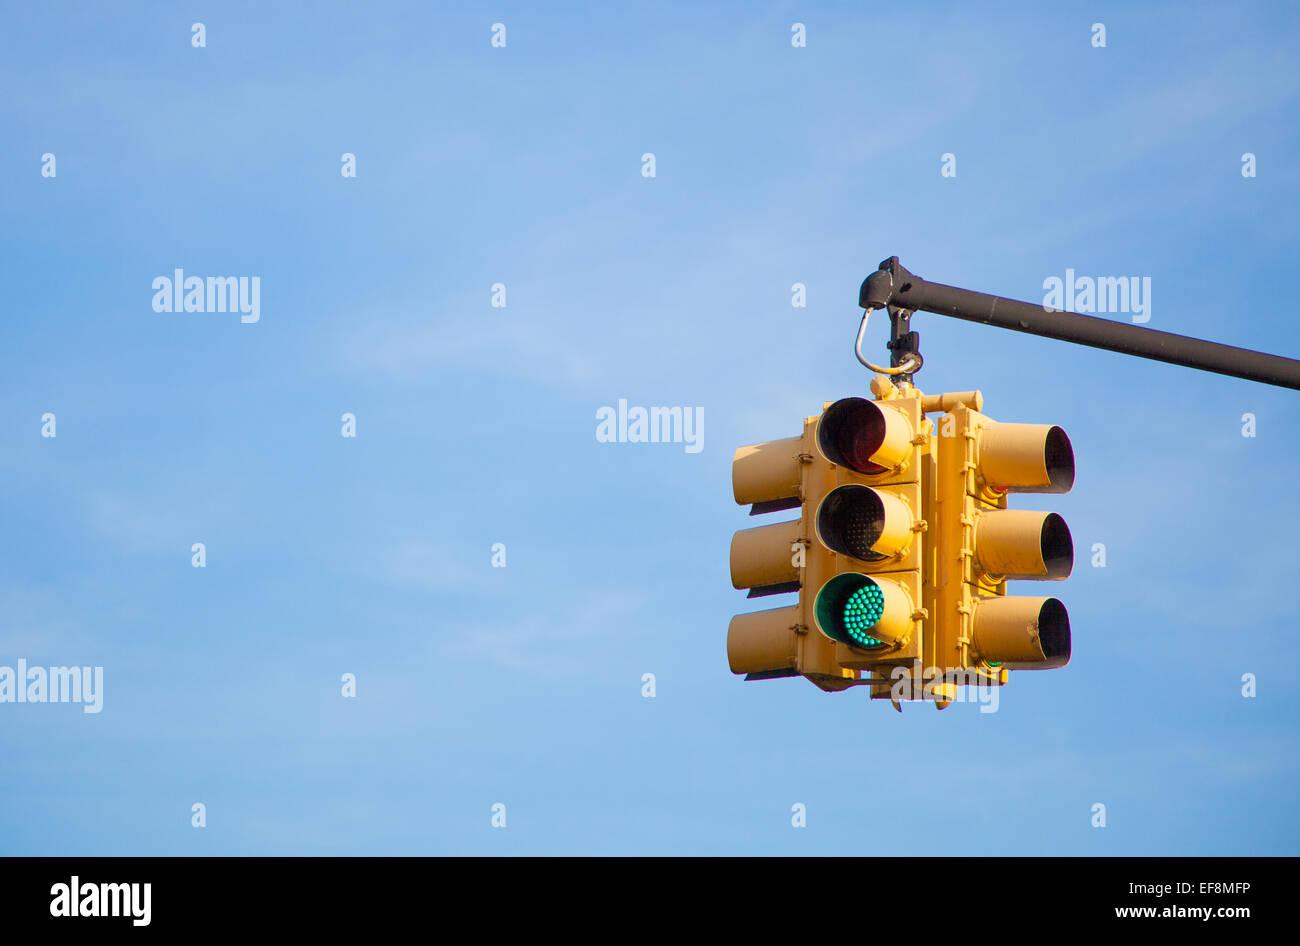 US Traffic lights - Stock Image